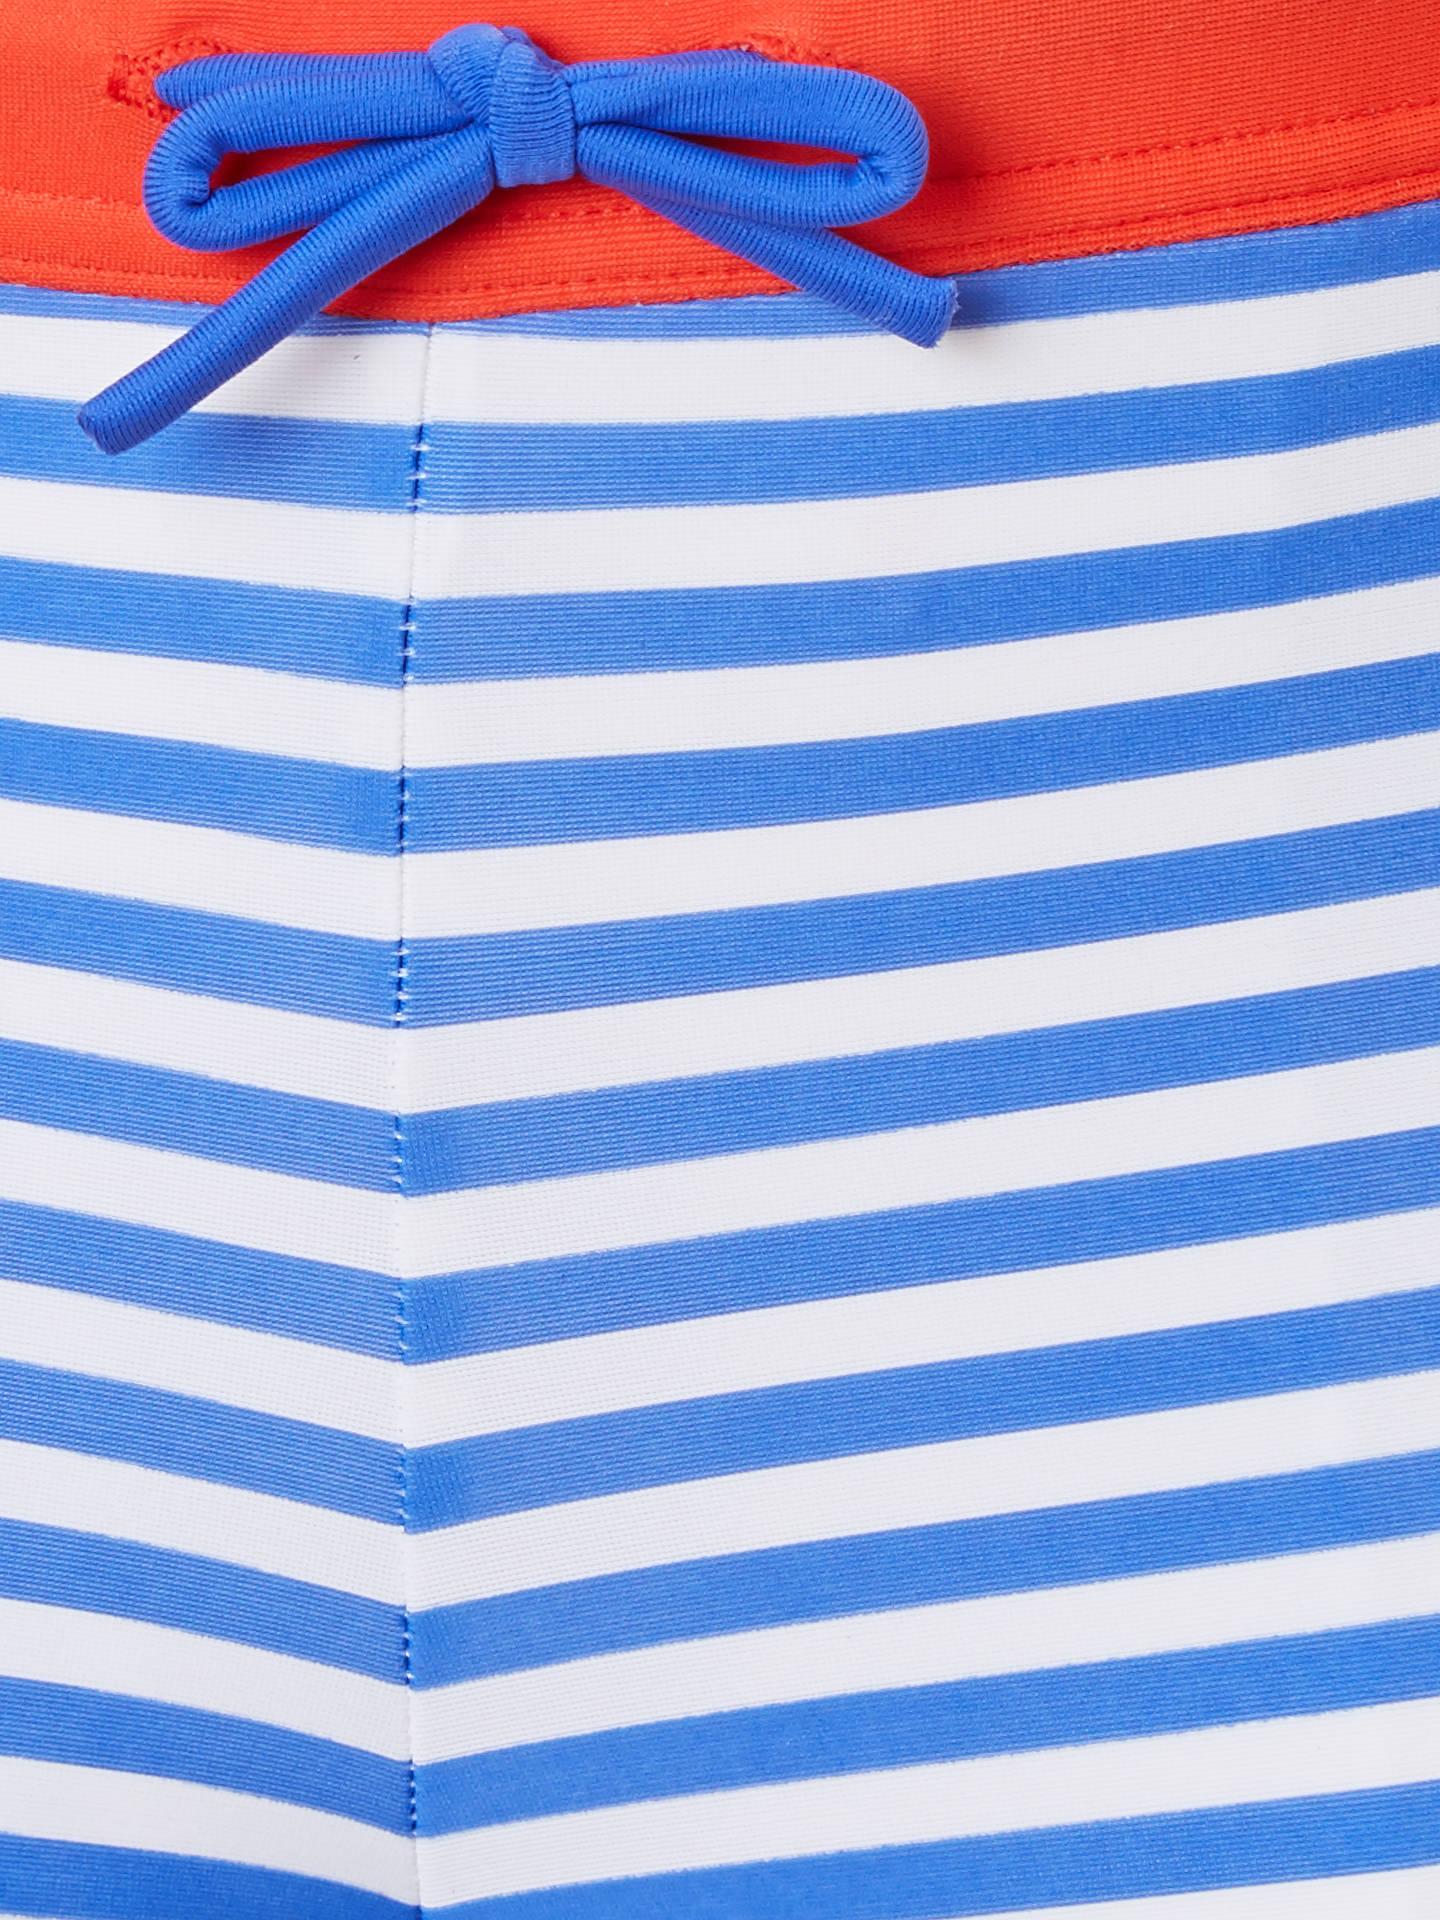 7a99cd295 ... BuyJohn Lewis   Partners Boys  Stripe Printed Swimming Trunks